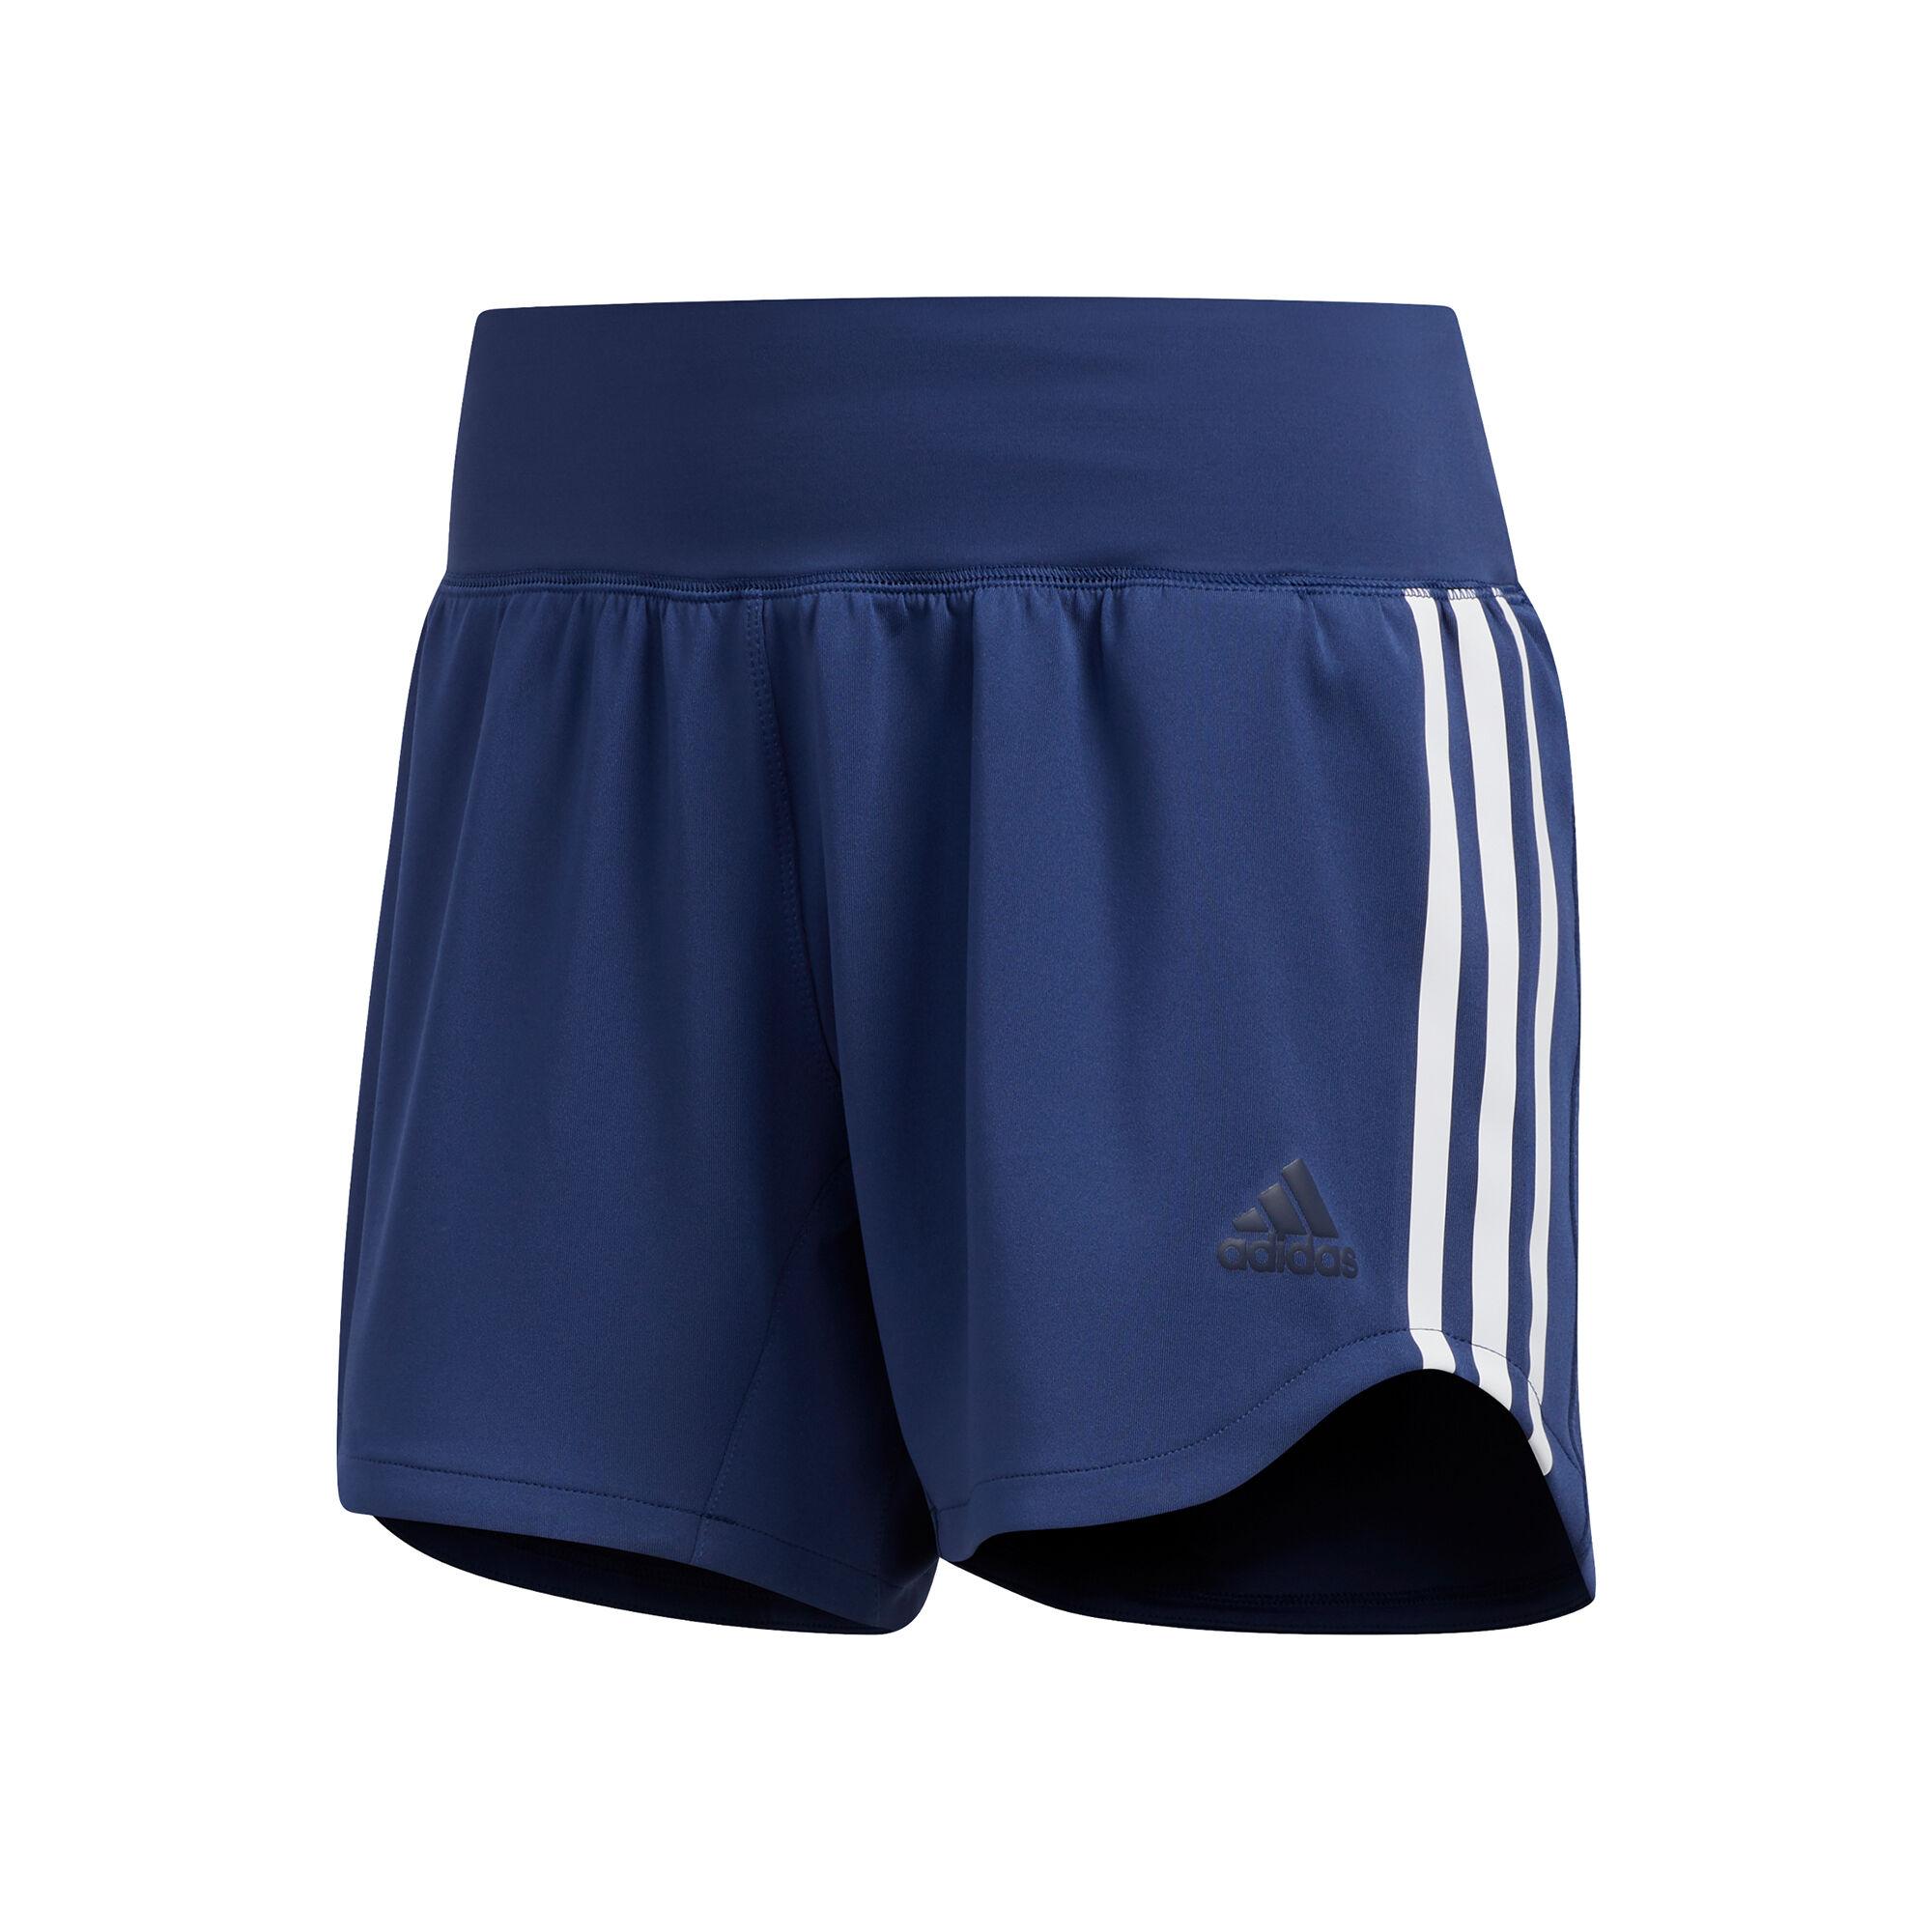 adidas 3-Stripes Woven Shorts Damen - Blau, Weiß